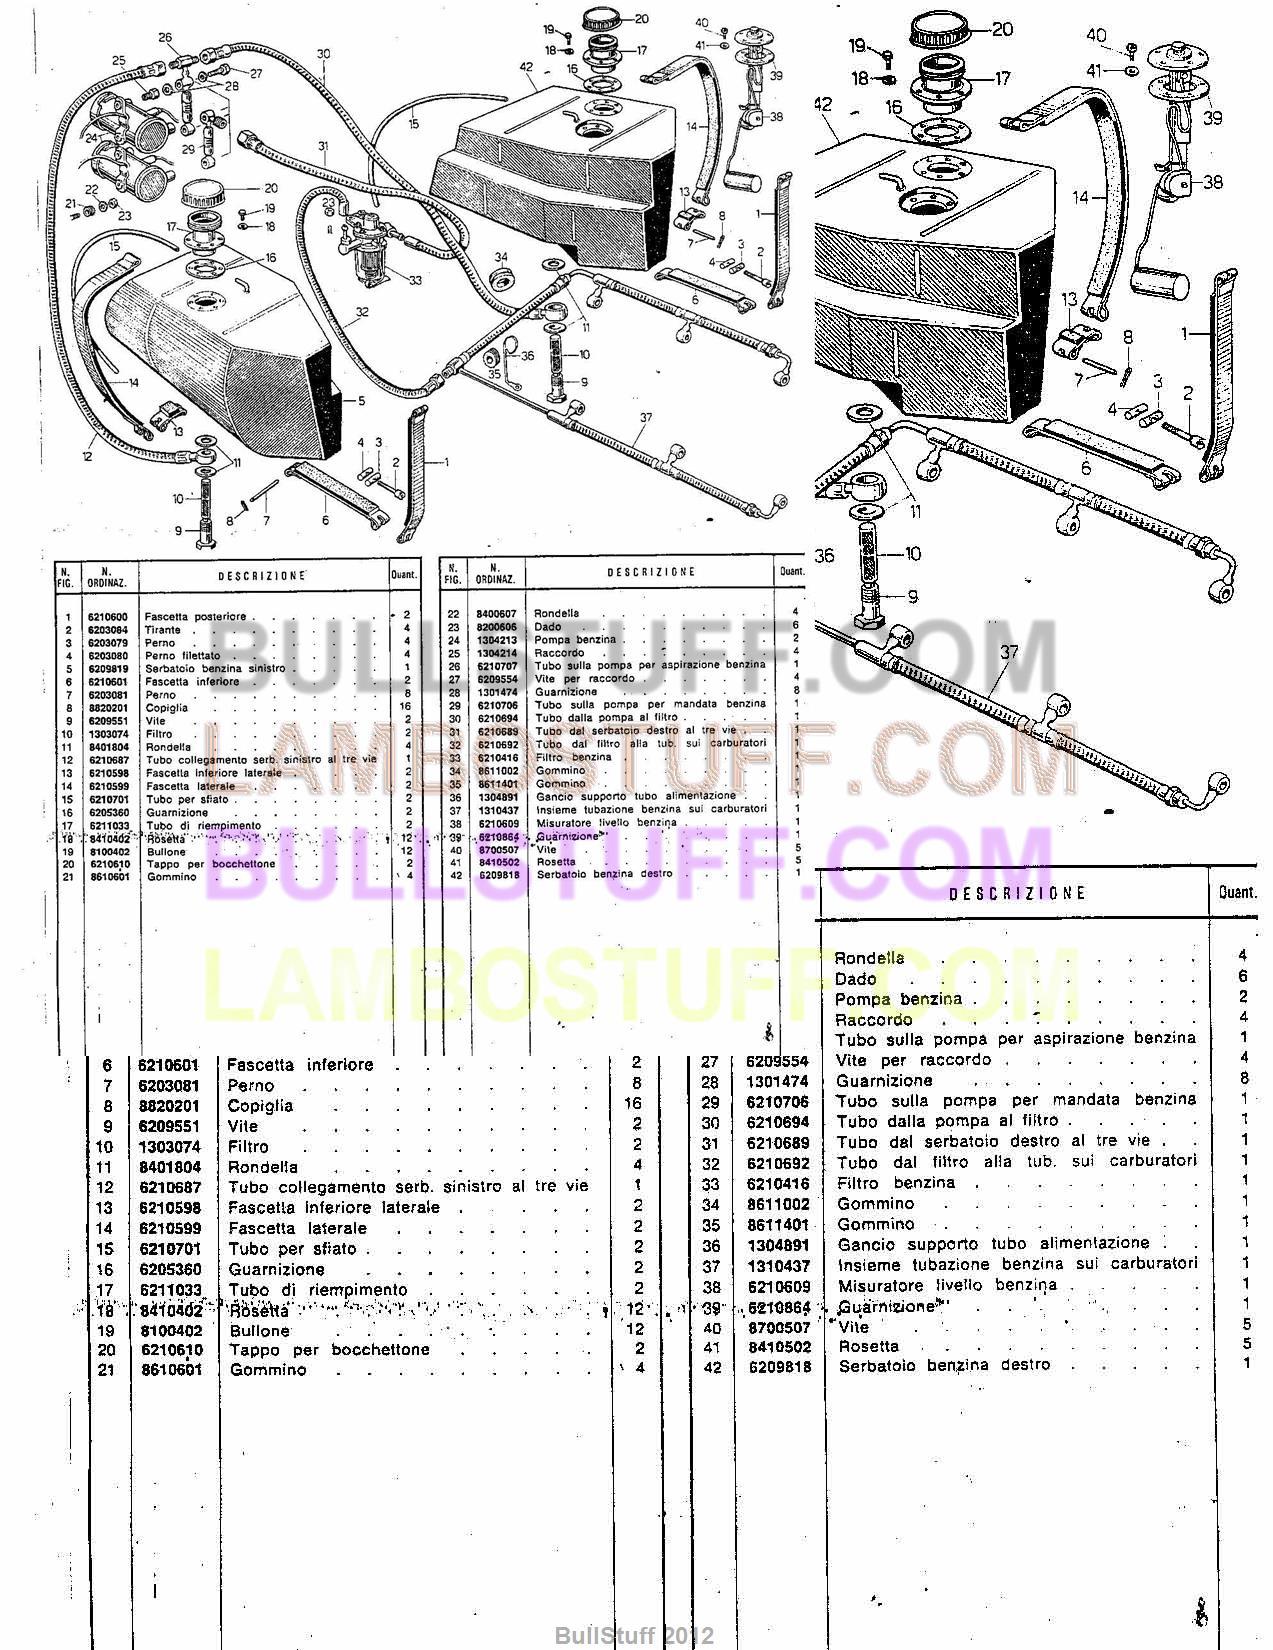 1989 cr250 service manual pdf